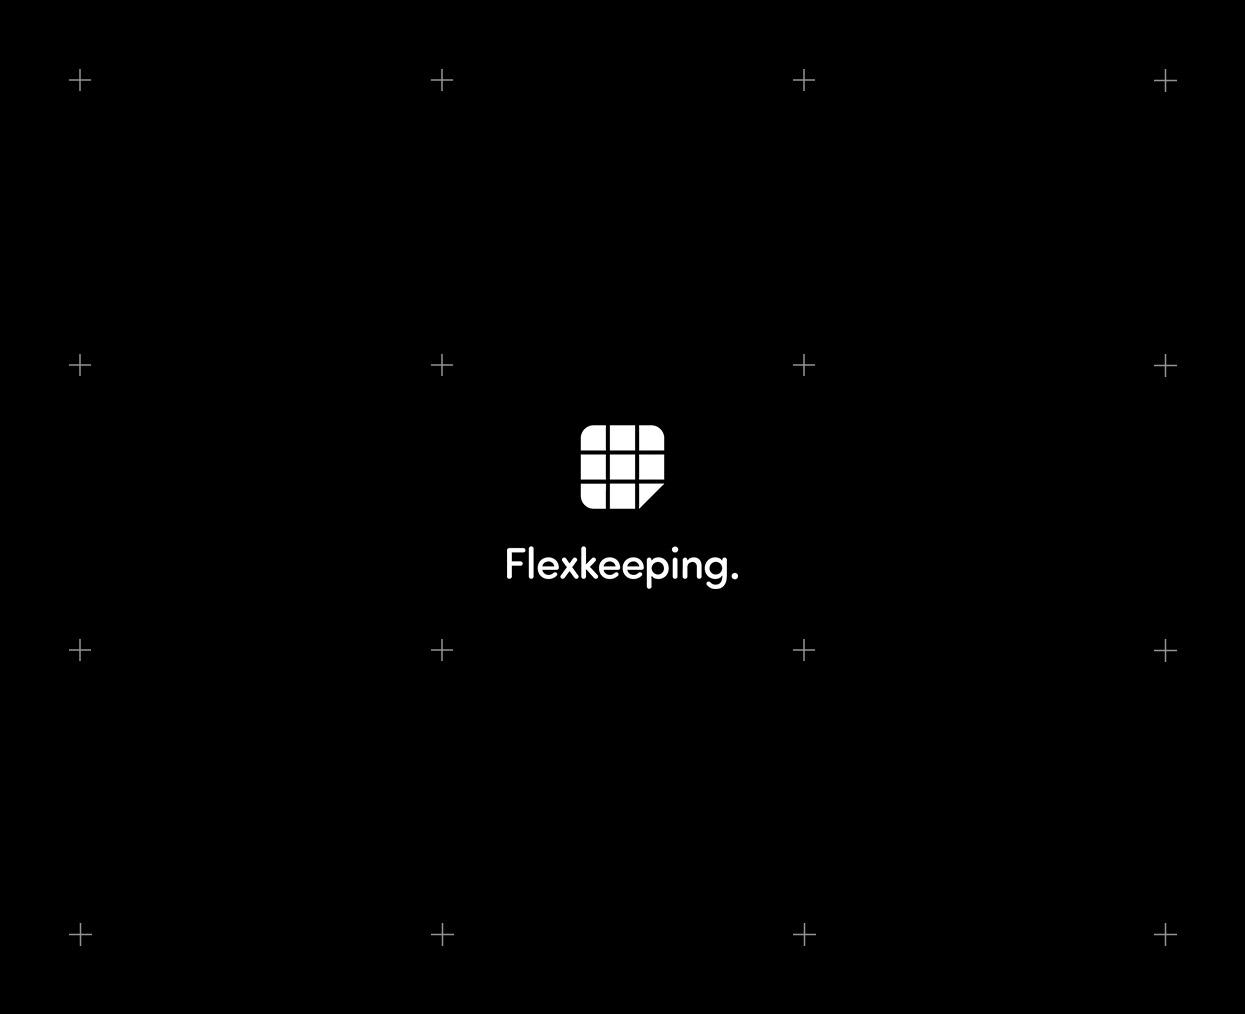 Flexkeeping_830x66